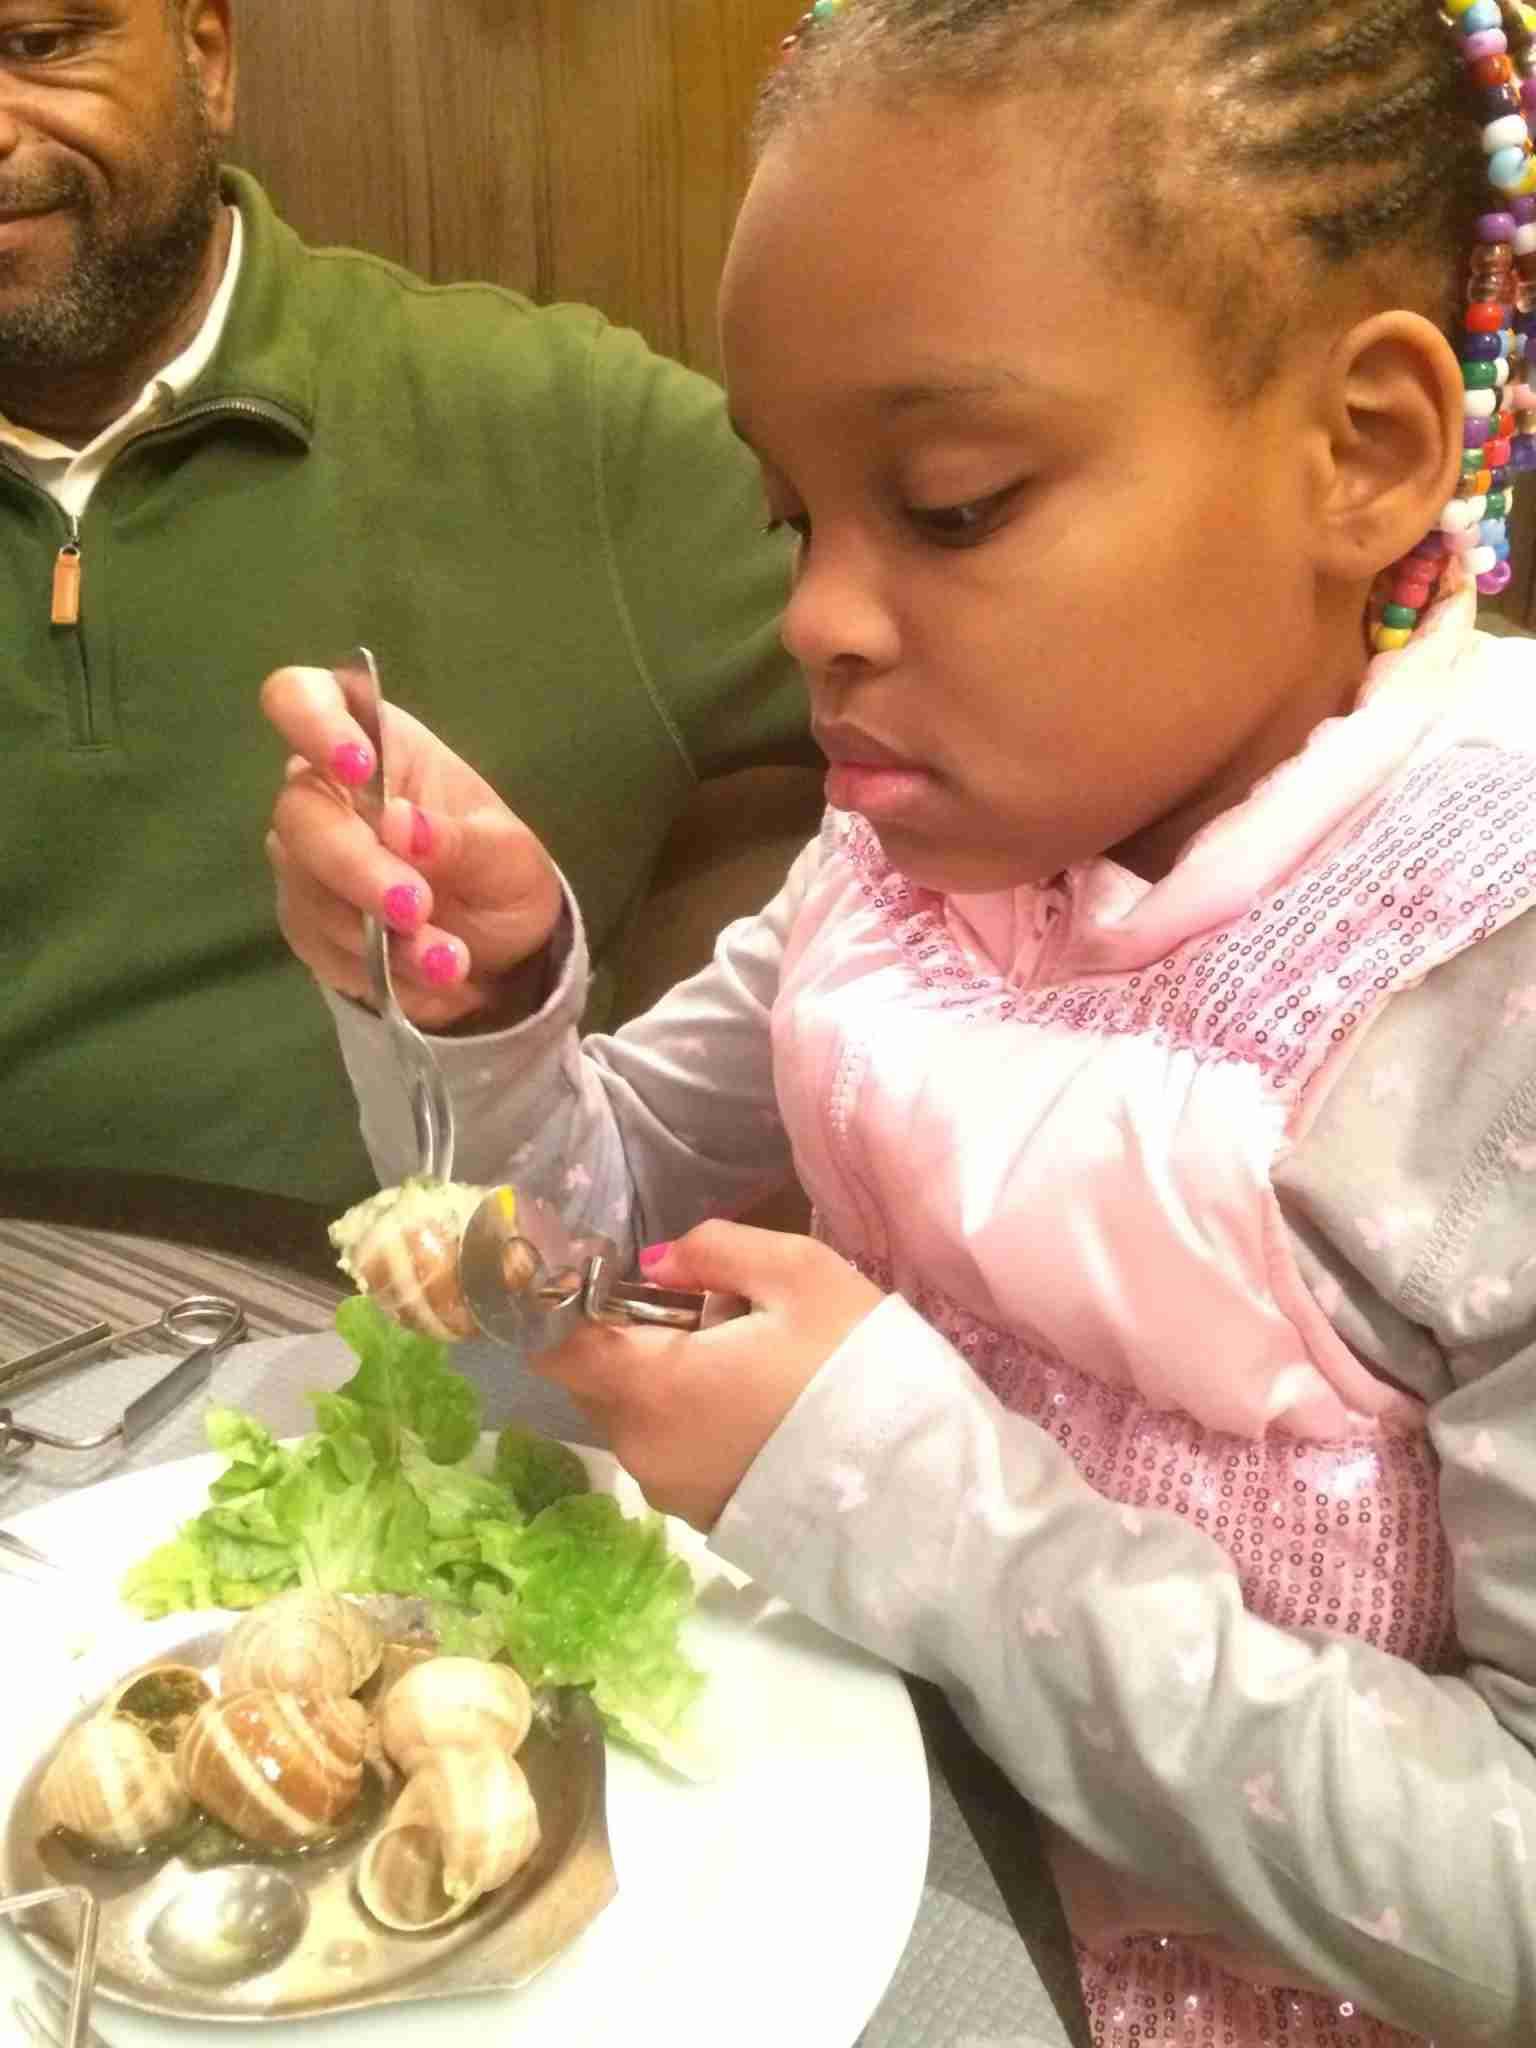 My daughter enjoying escargot during a Christmas trip to Paris. (Photo by Benét J. Wilson/The Points Guy)